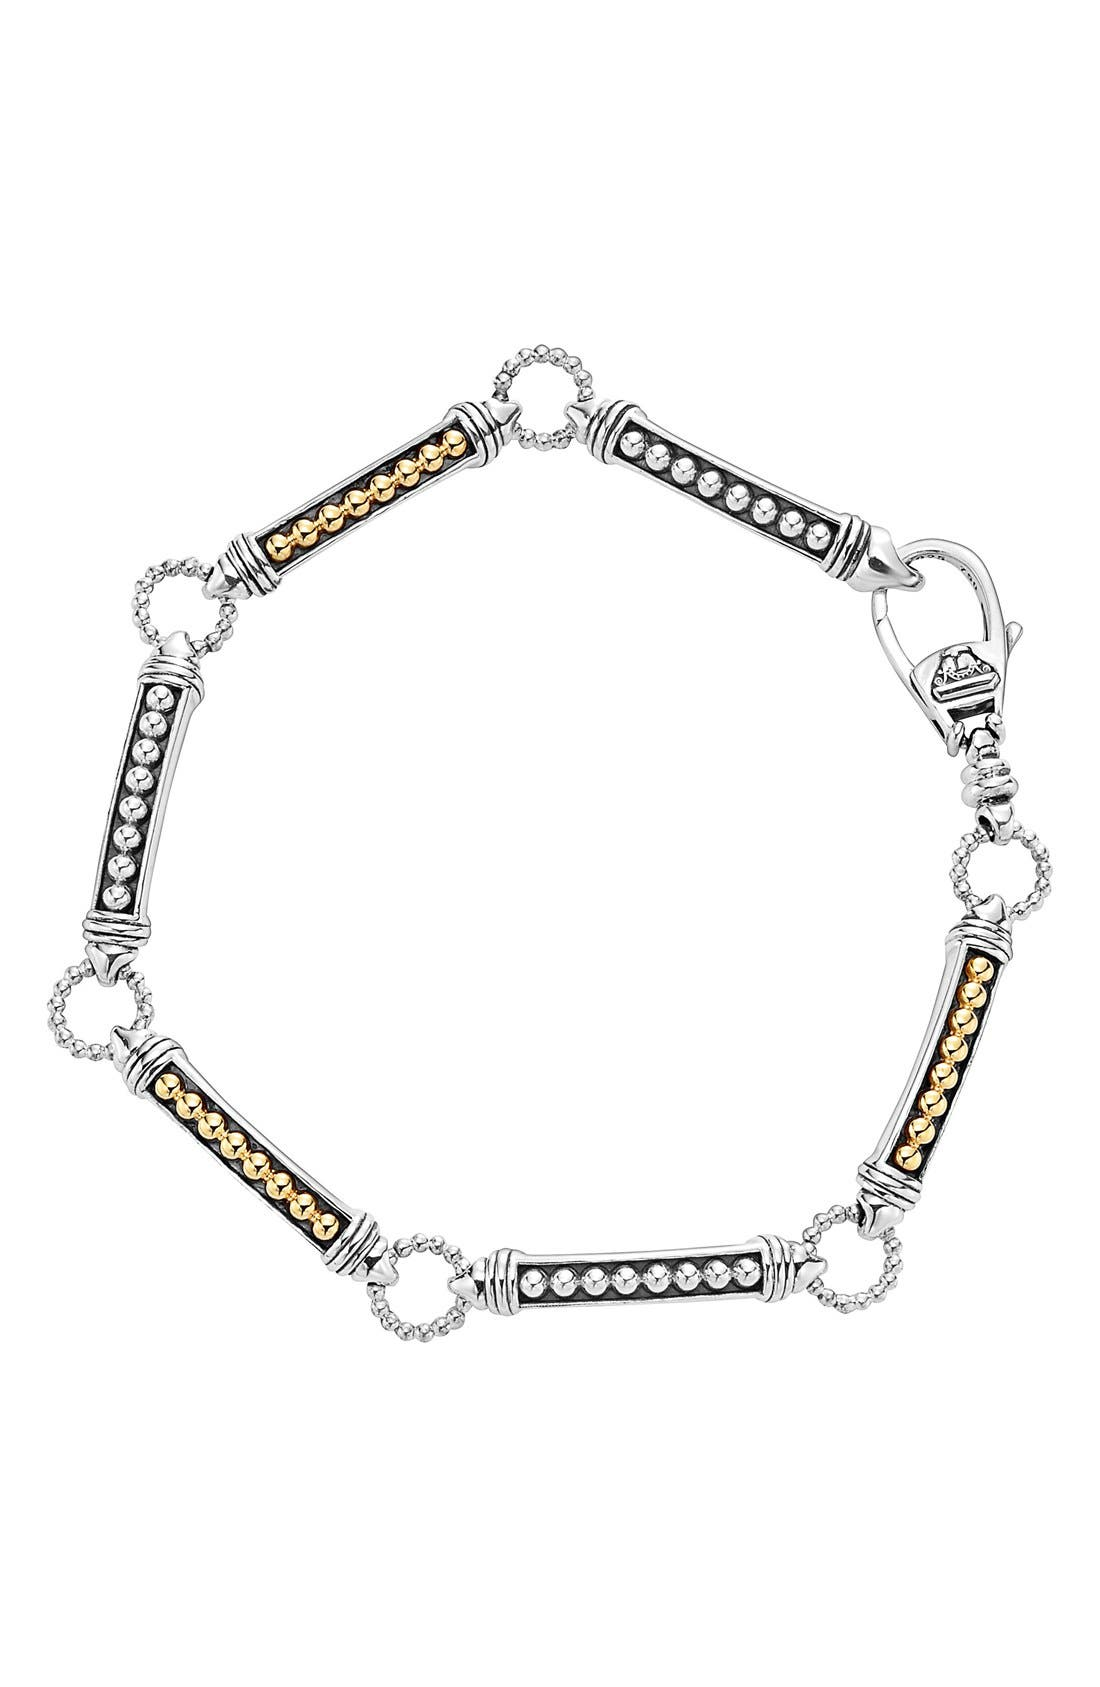 Main Image - LAGOS Caviar 'Superfine' Two-Tone Line Bracelet